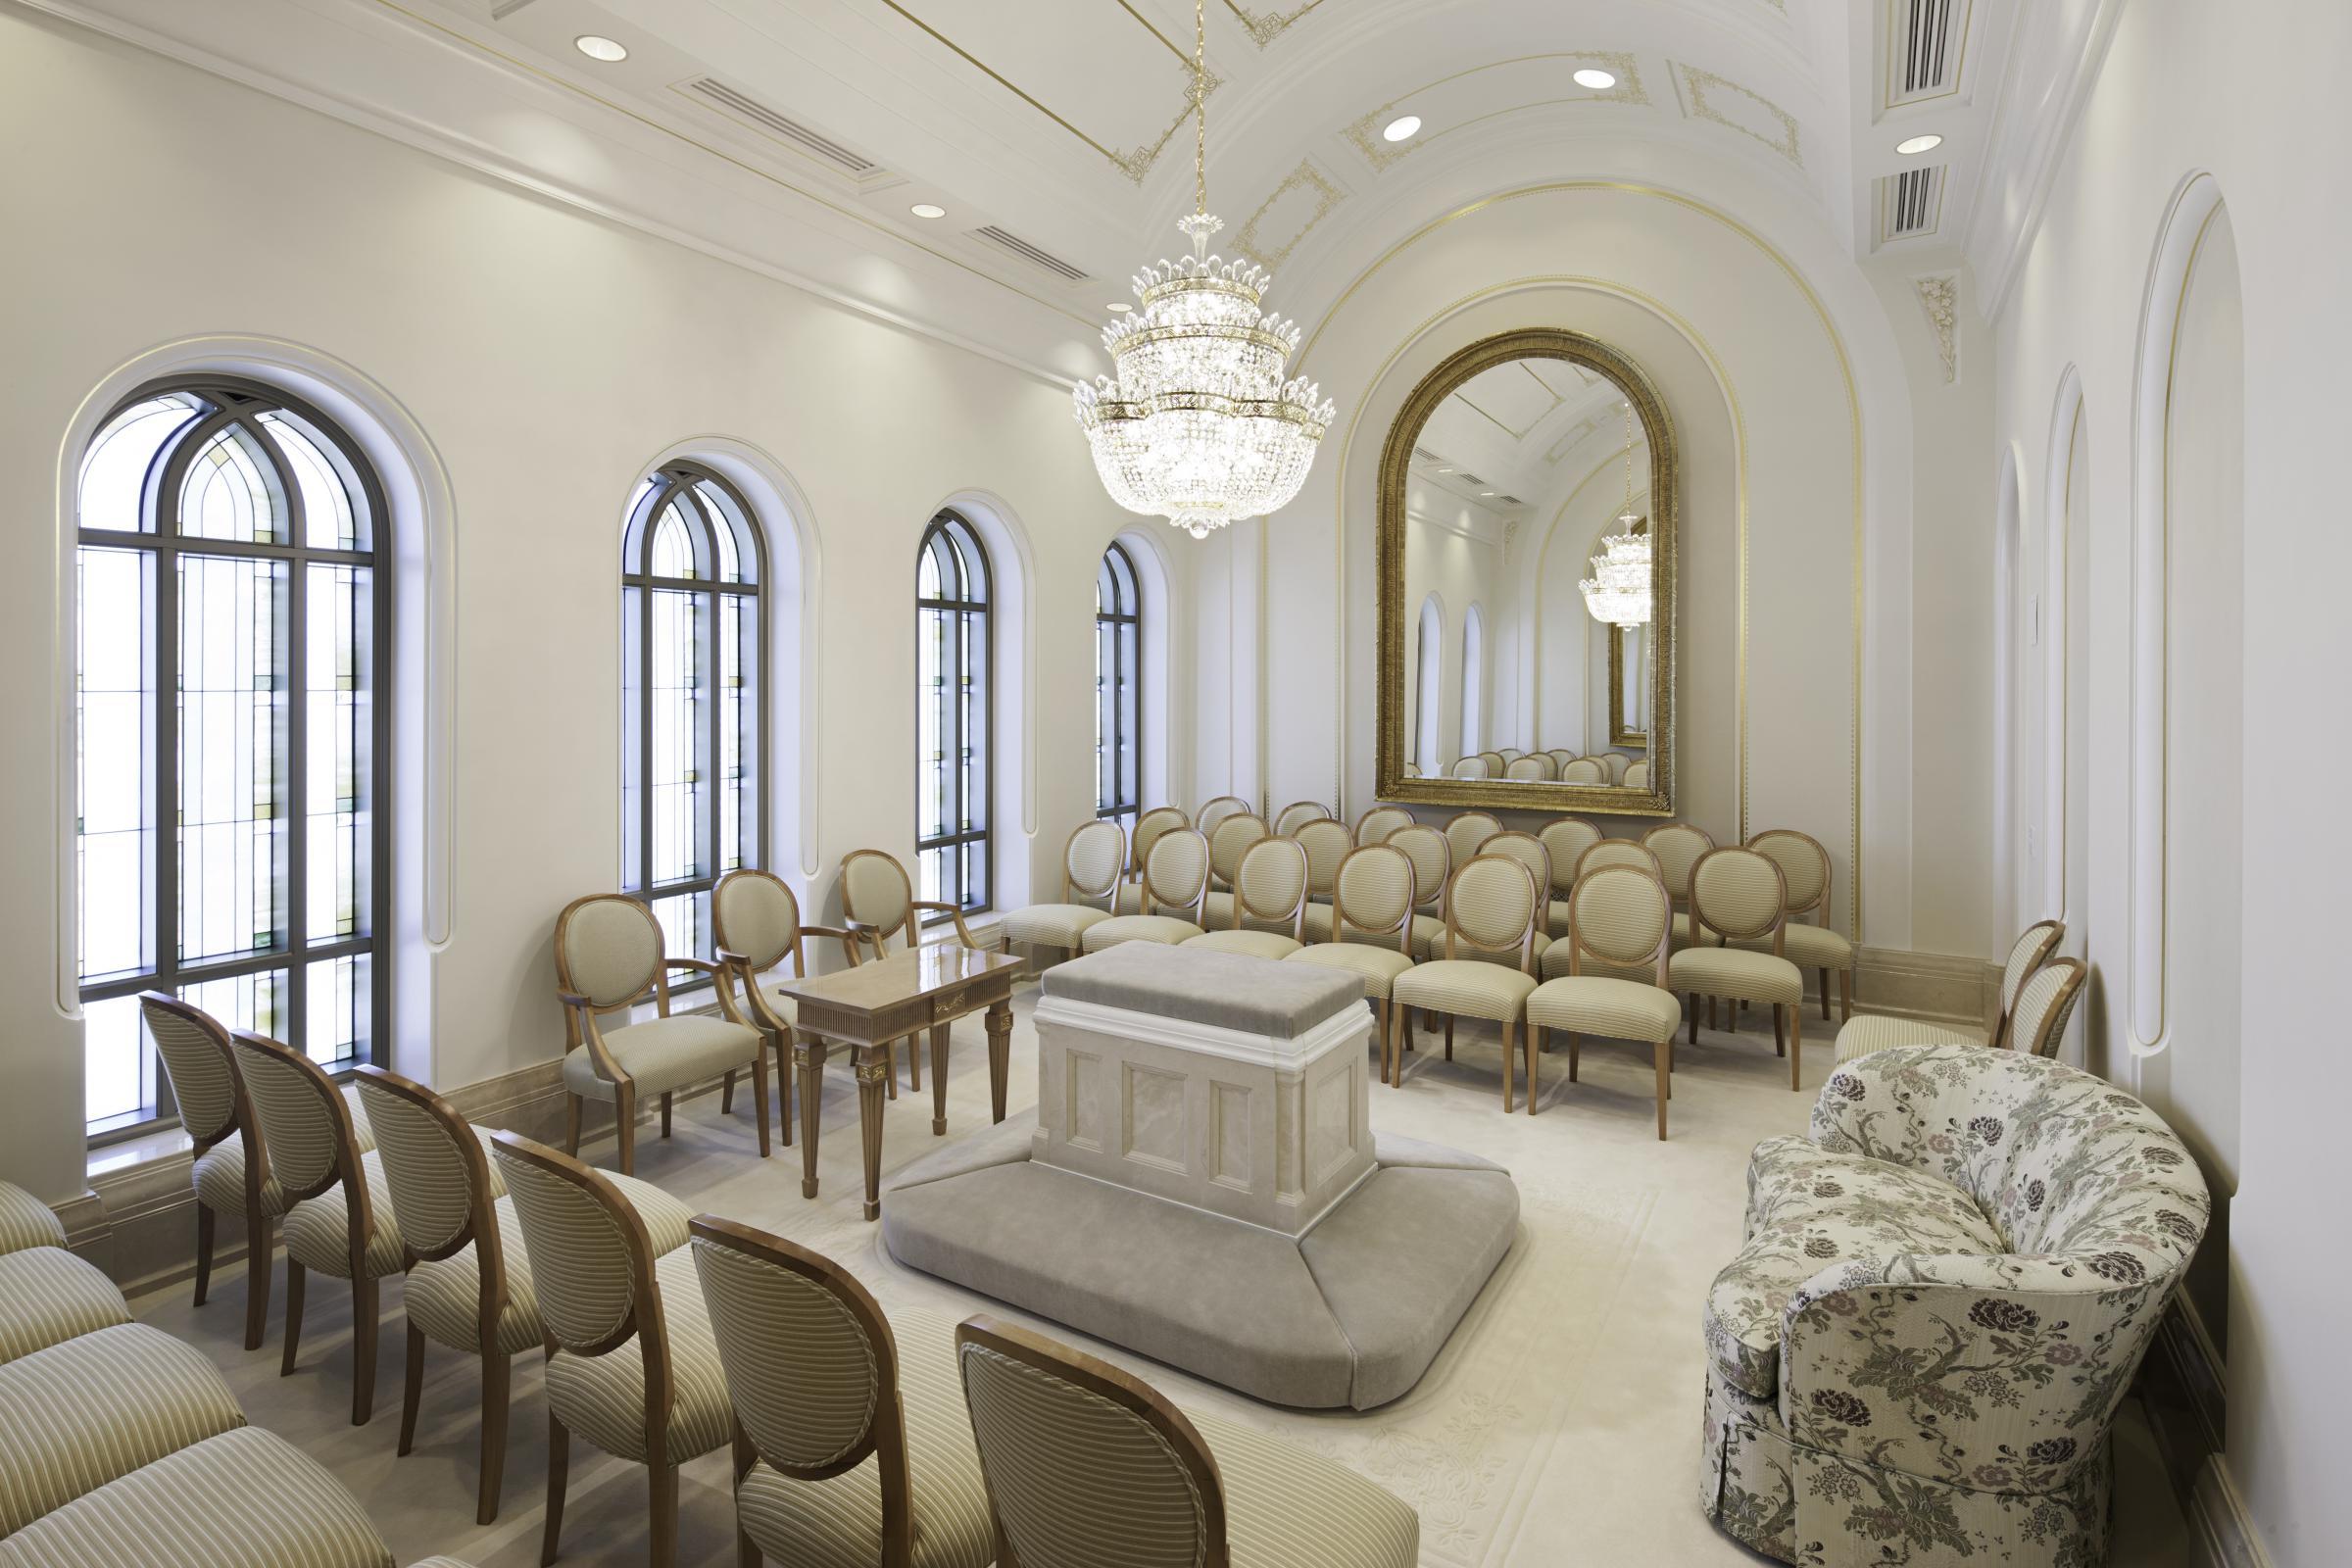 Inside The New Mormon Temple